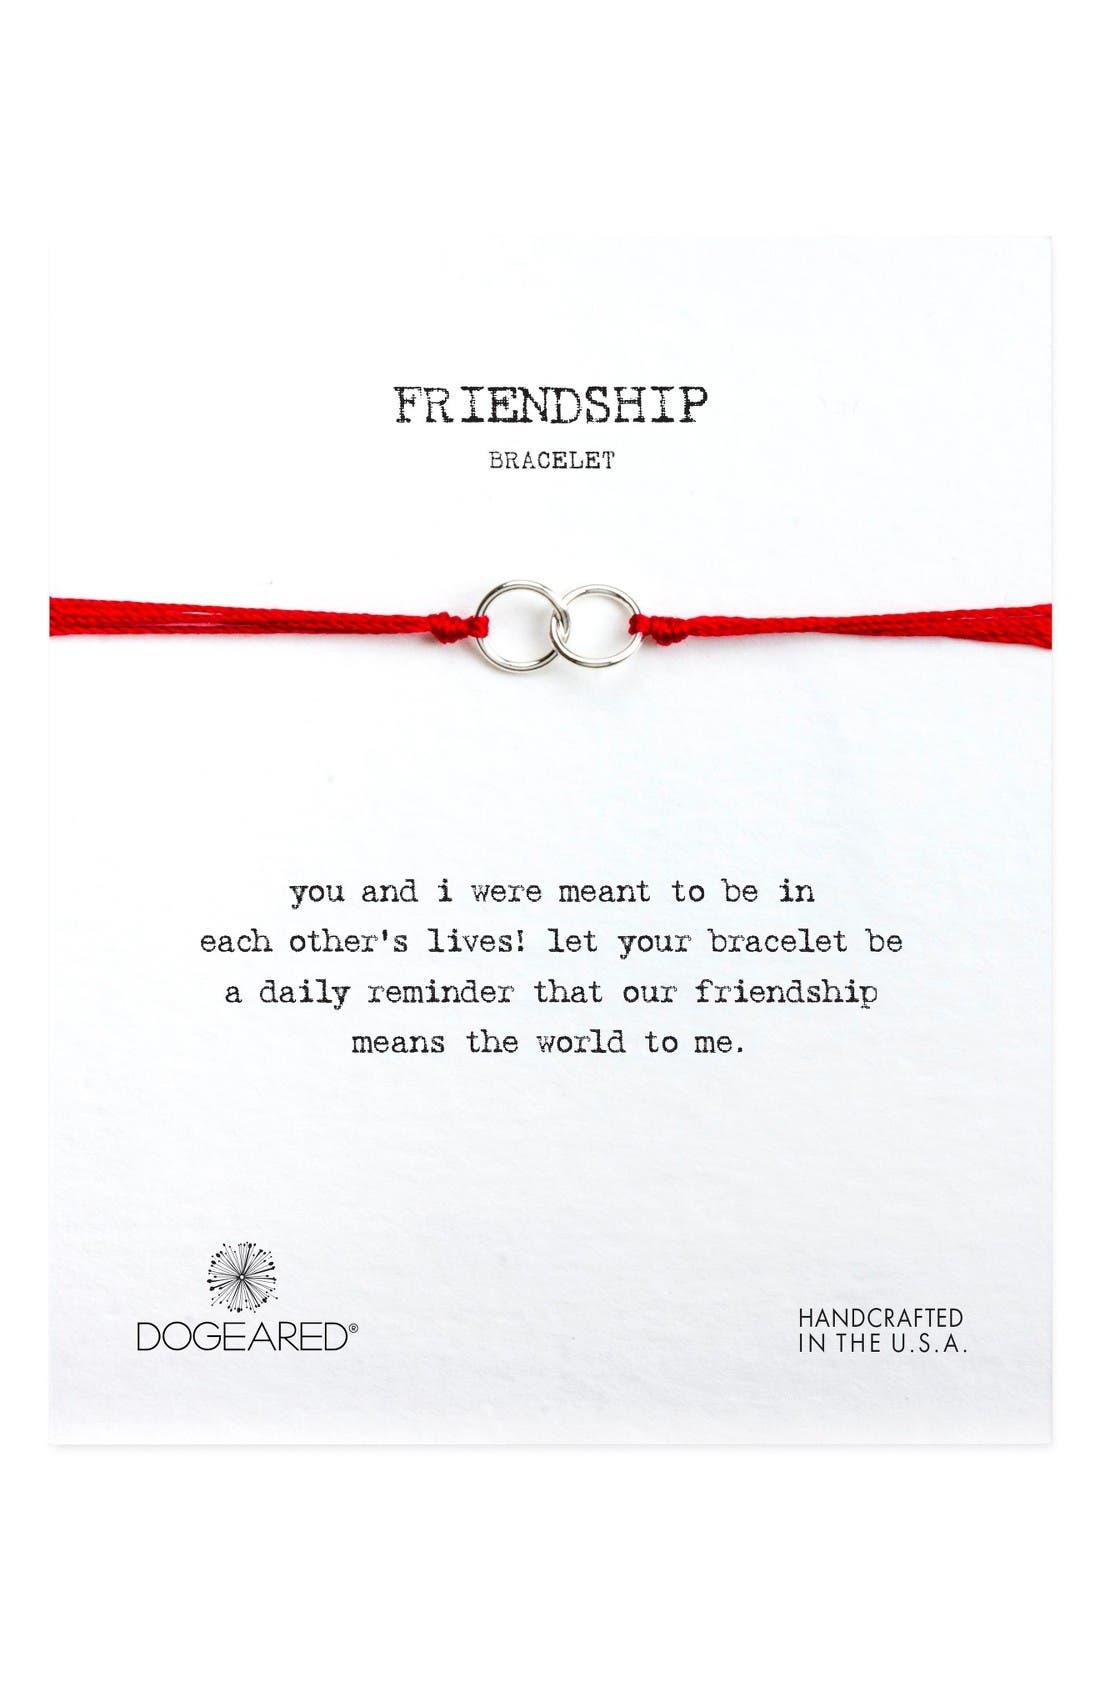 Alternate Image 1 Selected - Dogeared Double Linked Friendship Bracelet